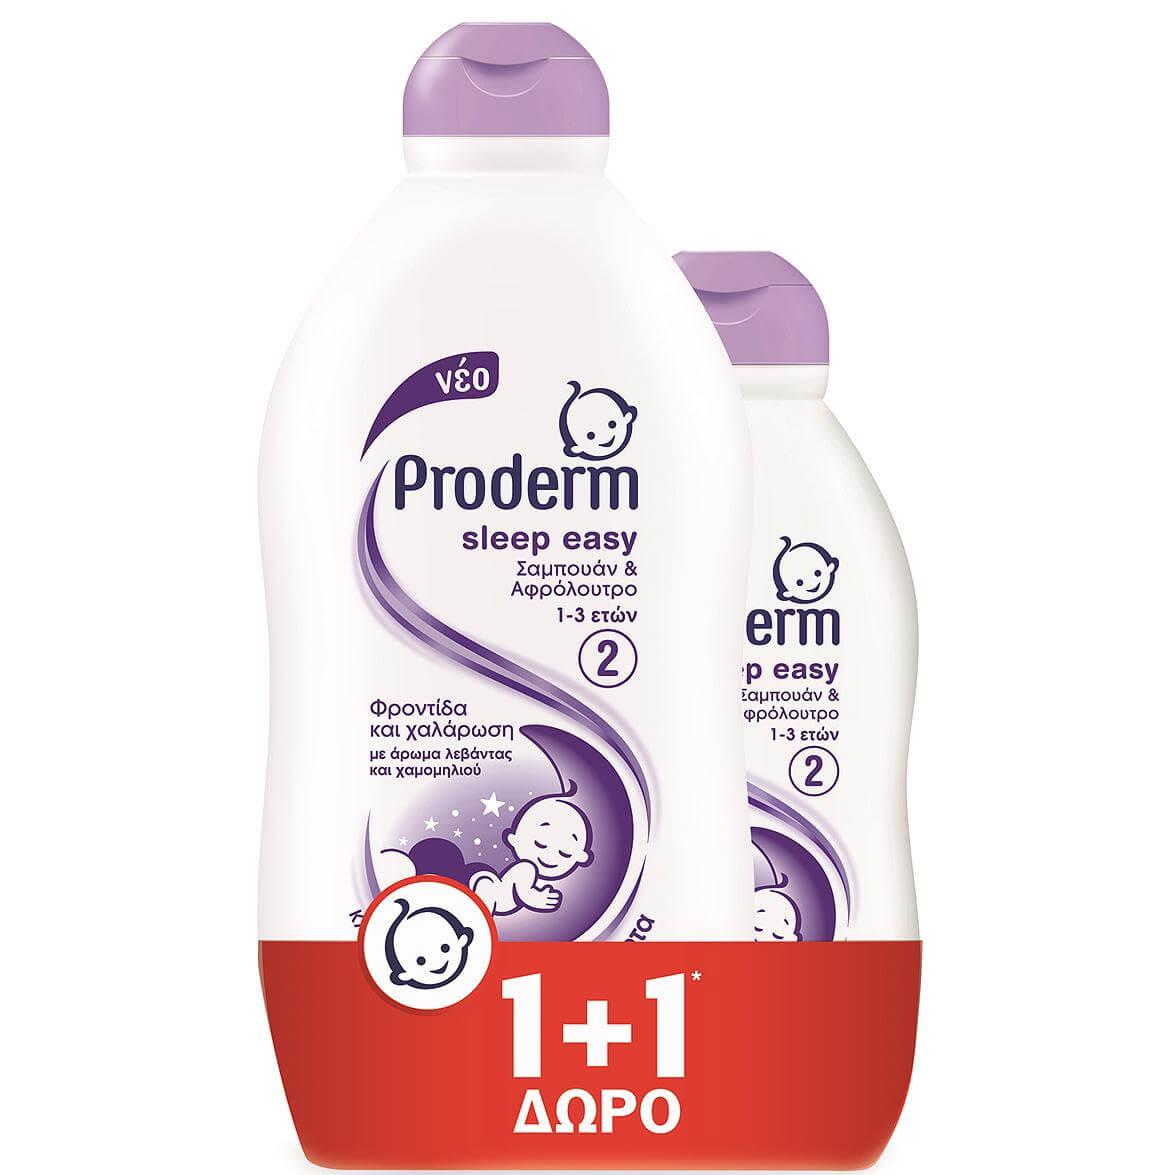 Proderm Sleep Easy Σαμπουάν & Αφρόλουτρο No2, Φροντίδα & Χαλάρωση για Ηλικίες 1-3 Ετών 400ml & Δώρο Επιπλέον Ποσότητα 200ml